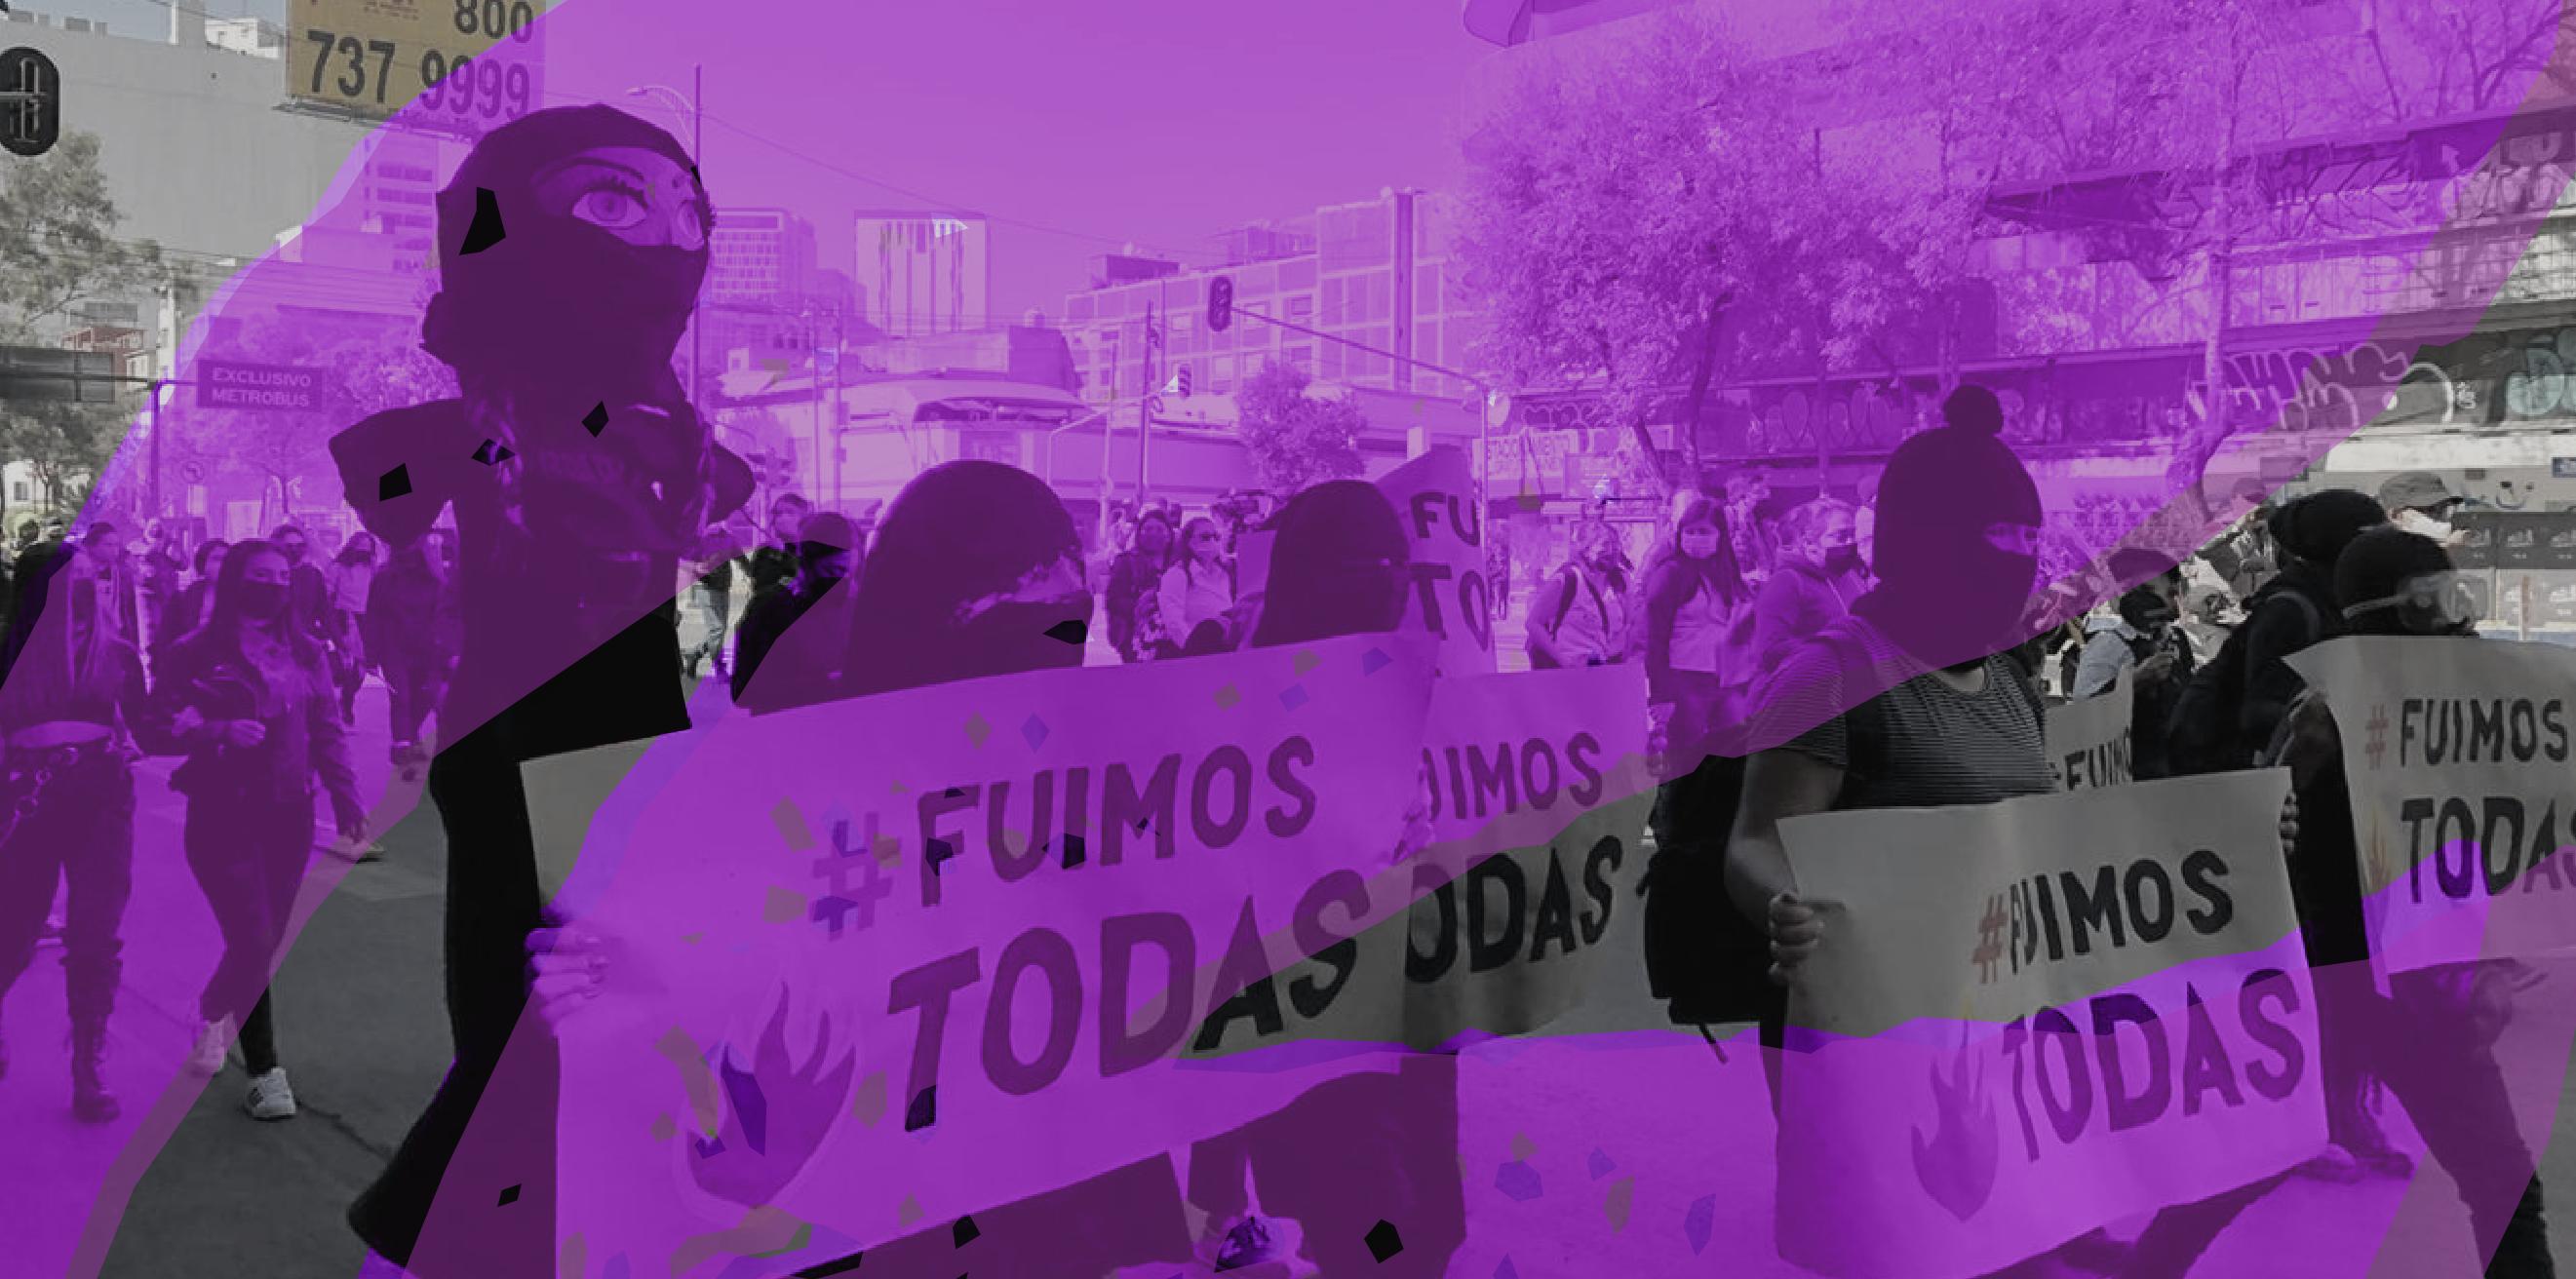 #FuimosTodas